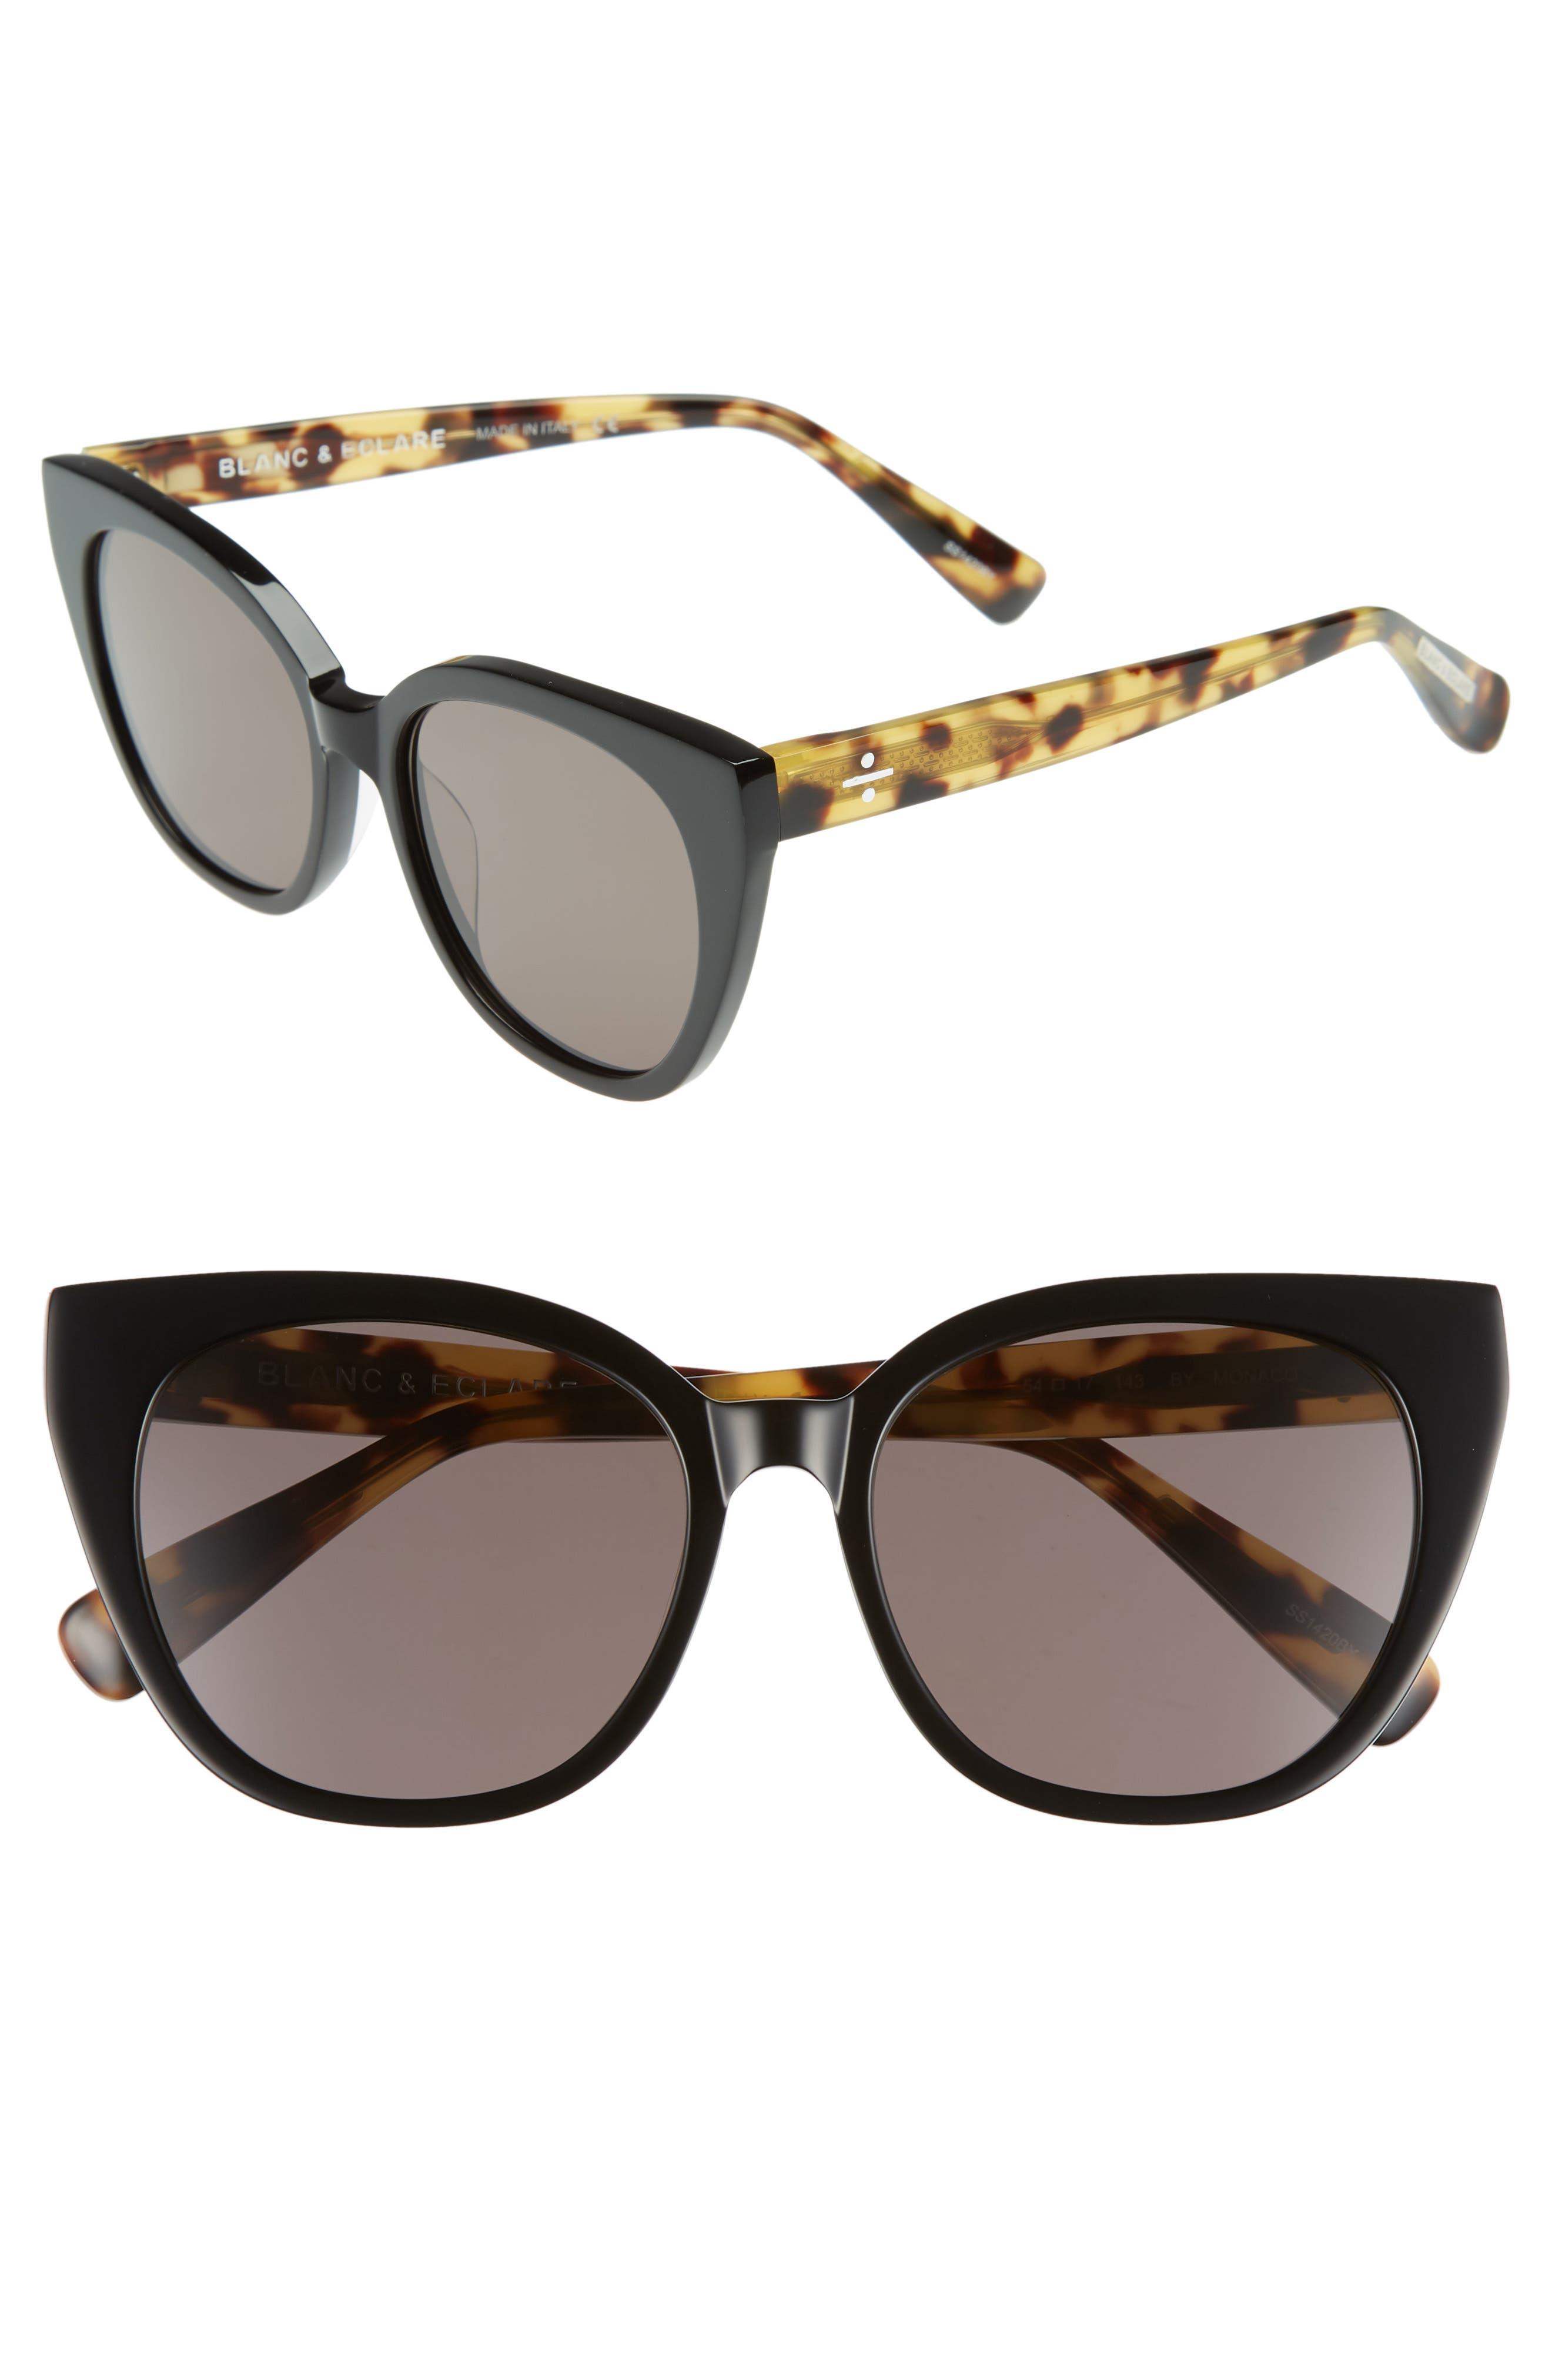 BLANC & ECLARE Monaco 54mm Cat Eye Sunglasses,                         Main,                         color, Black/ Lemon Tortoise/ Grey